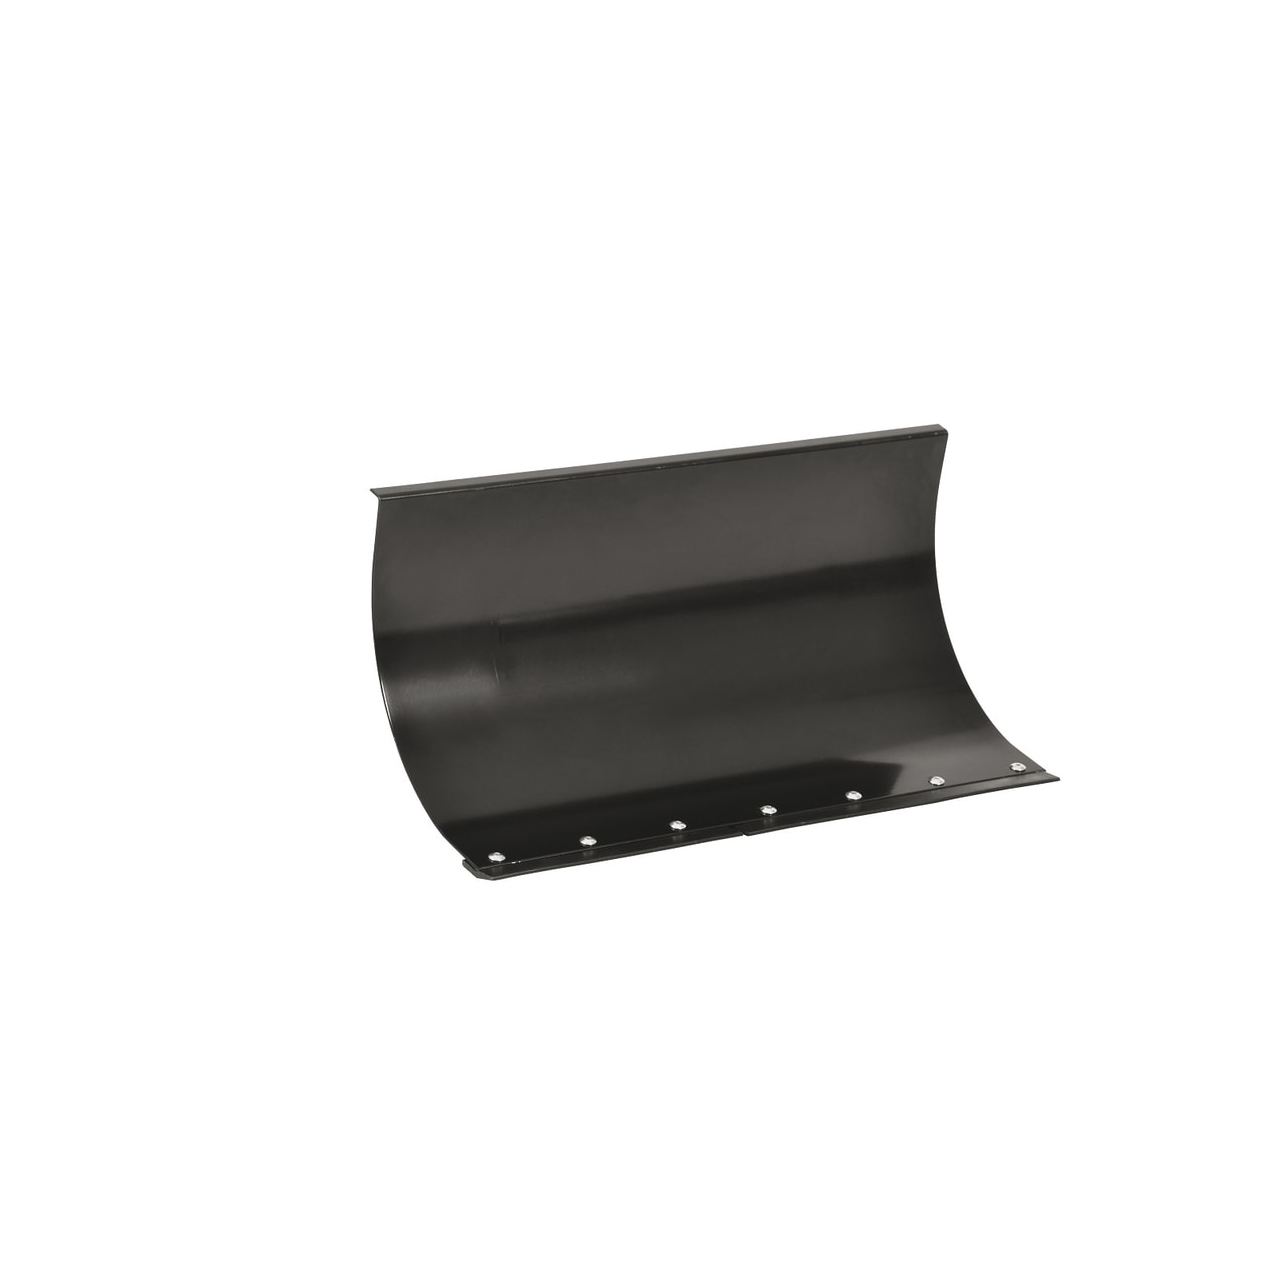 008680A - radlice 80 cm